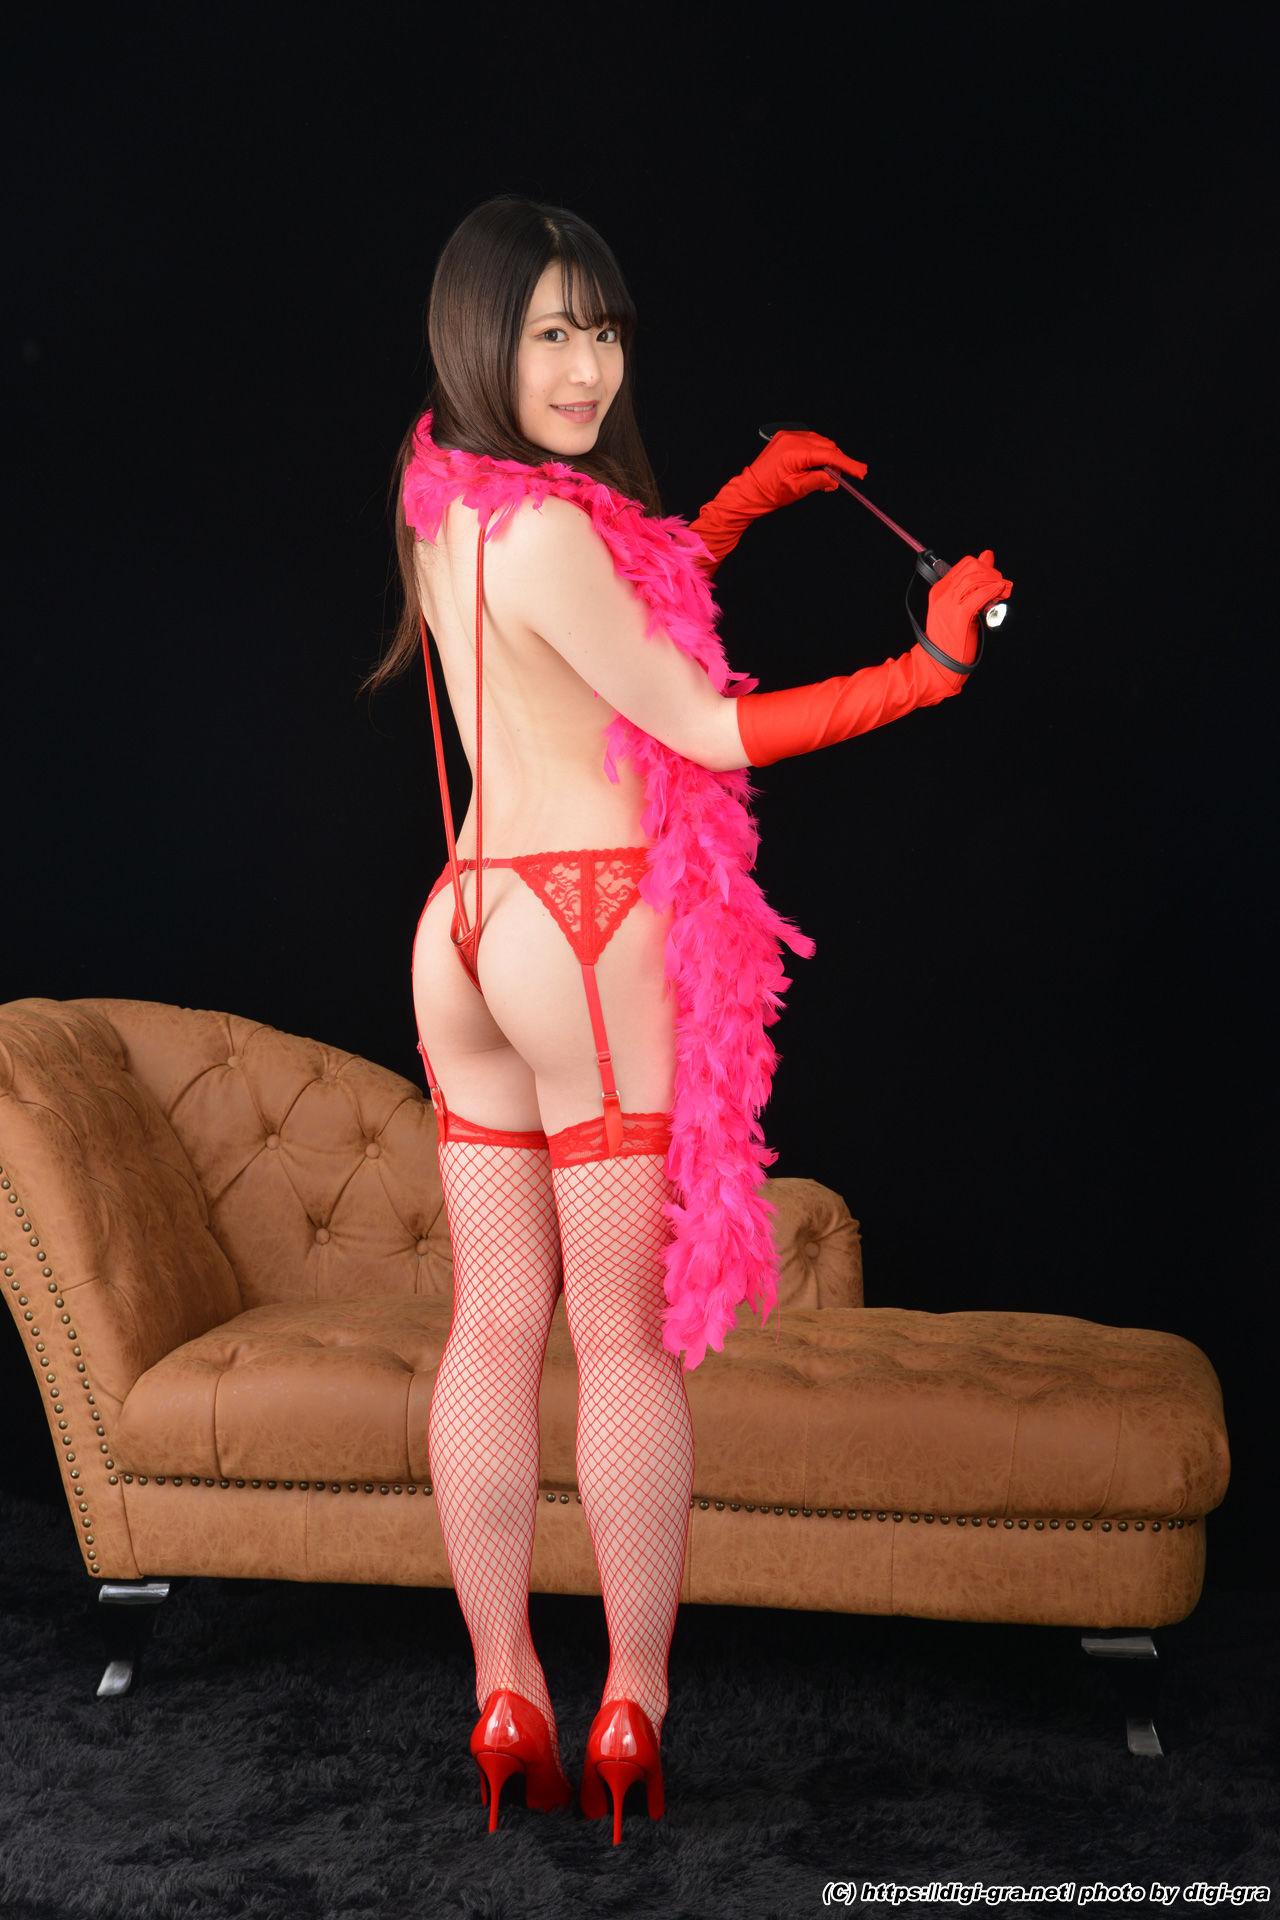 [Digi-Gra] Nanami Oozora 大空七海 Photoset 04 写真套图[70P]插图(6)